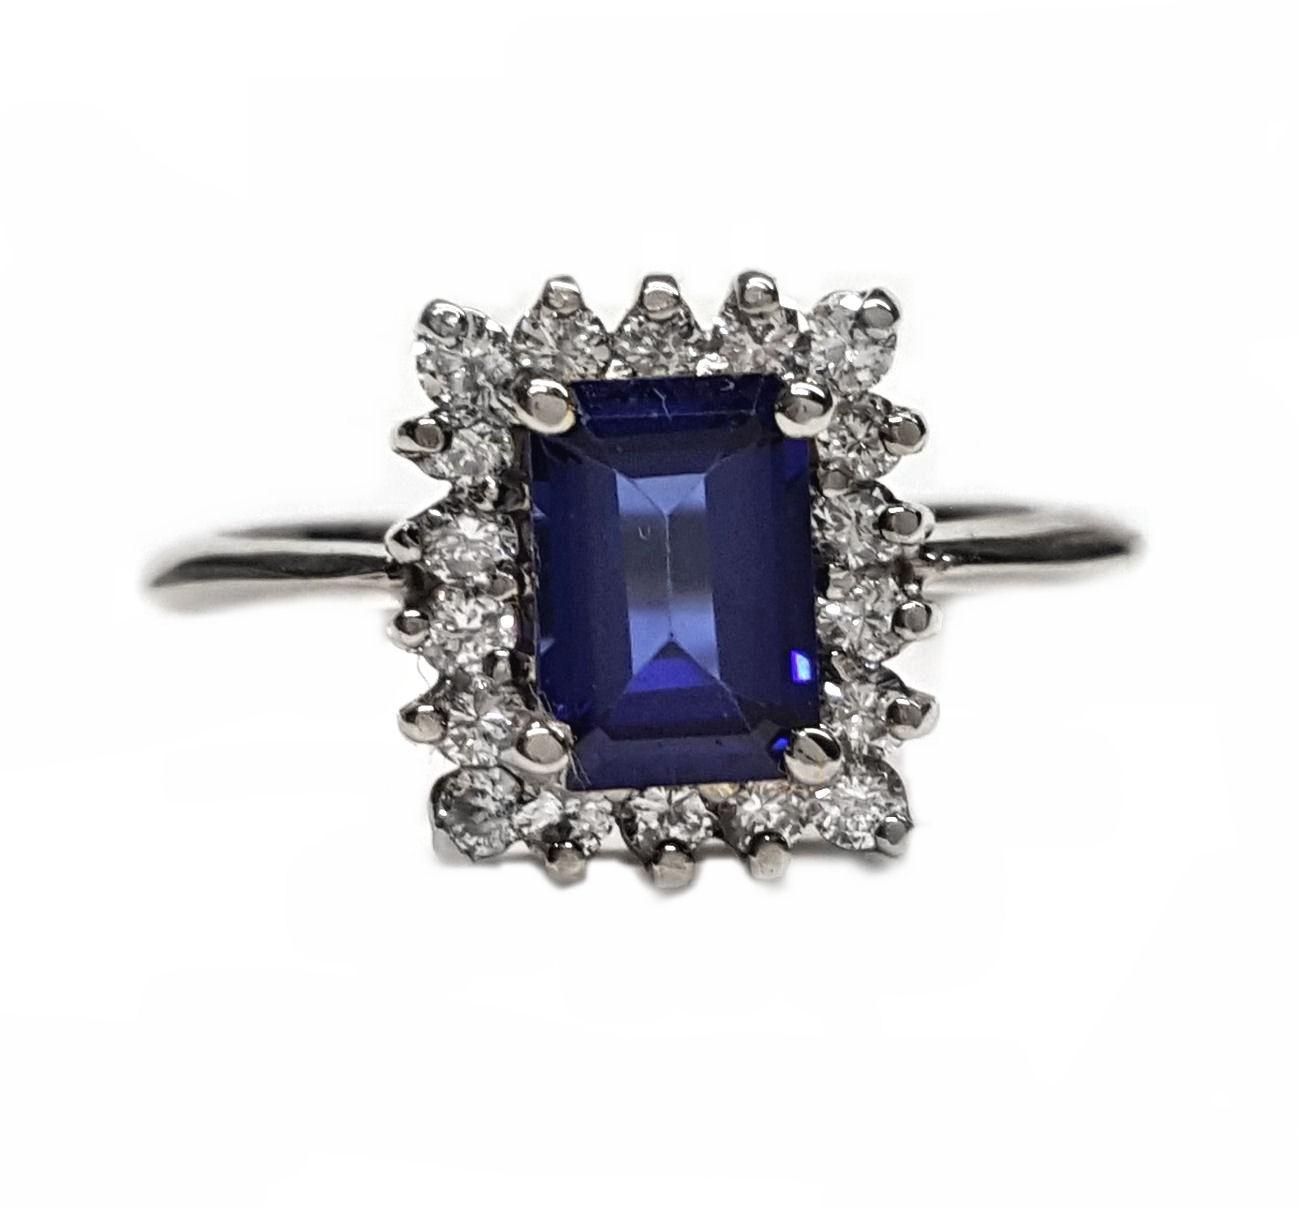 Emerald Cut sapphire & diamond cluster ring, 48pts dia's. t.w.